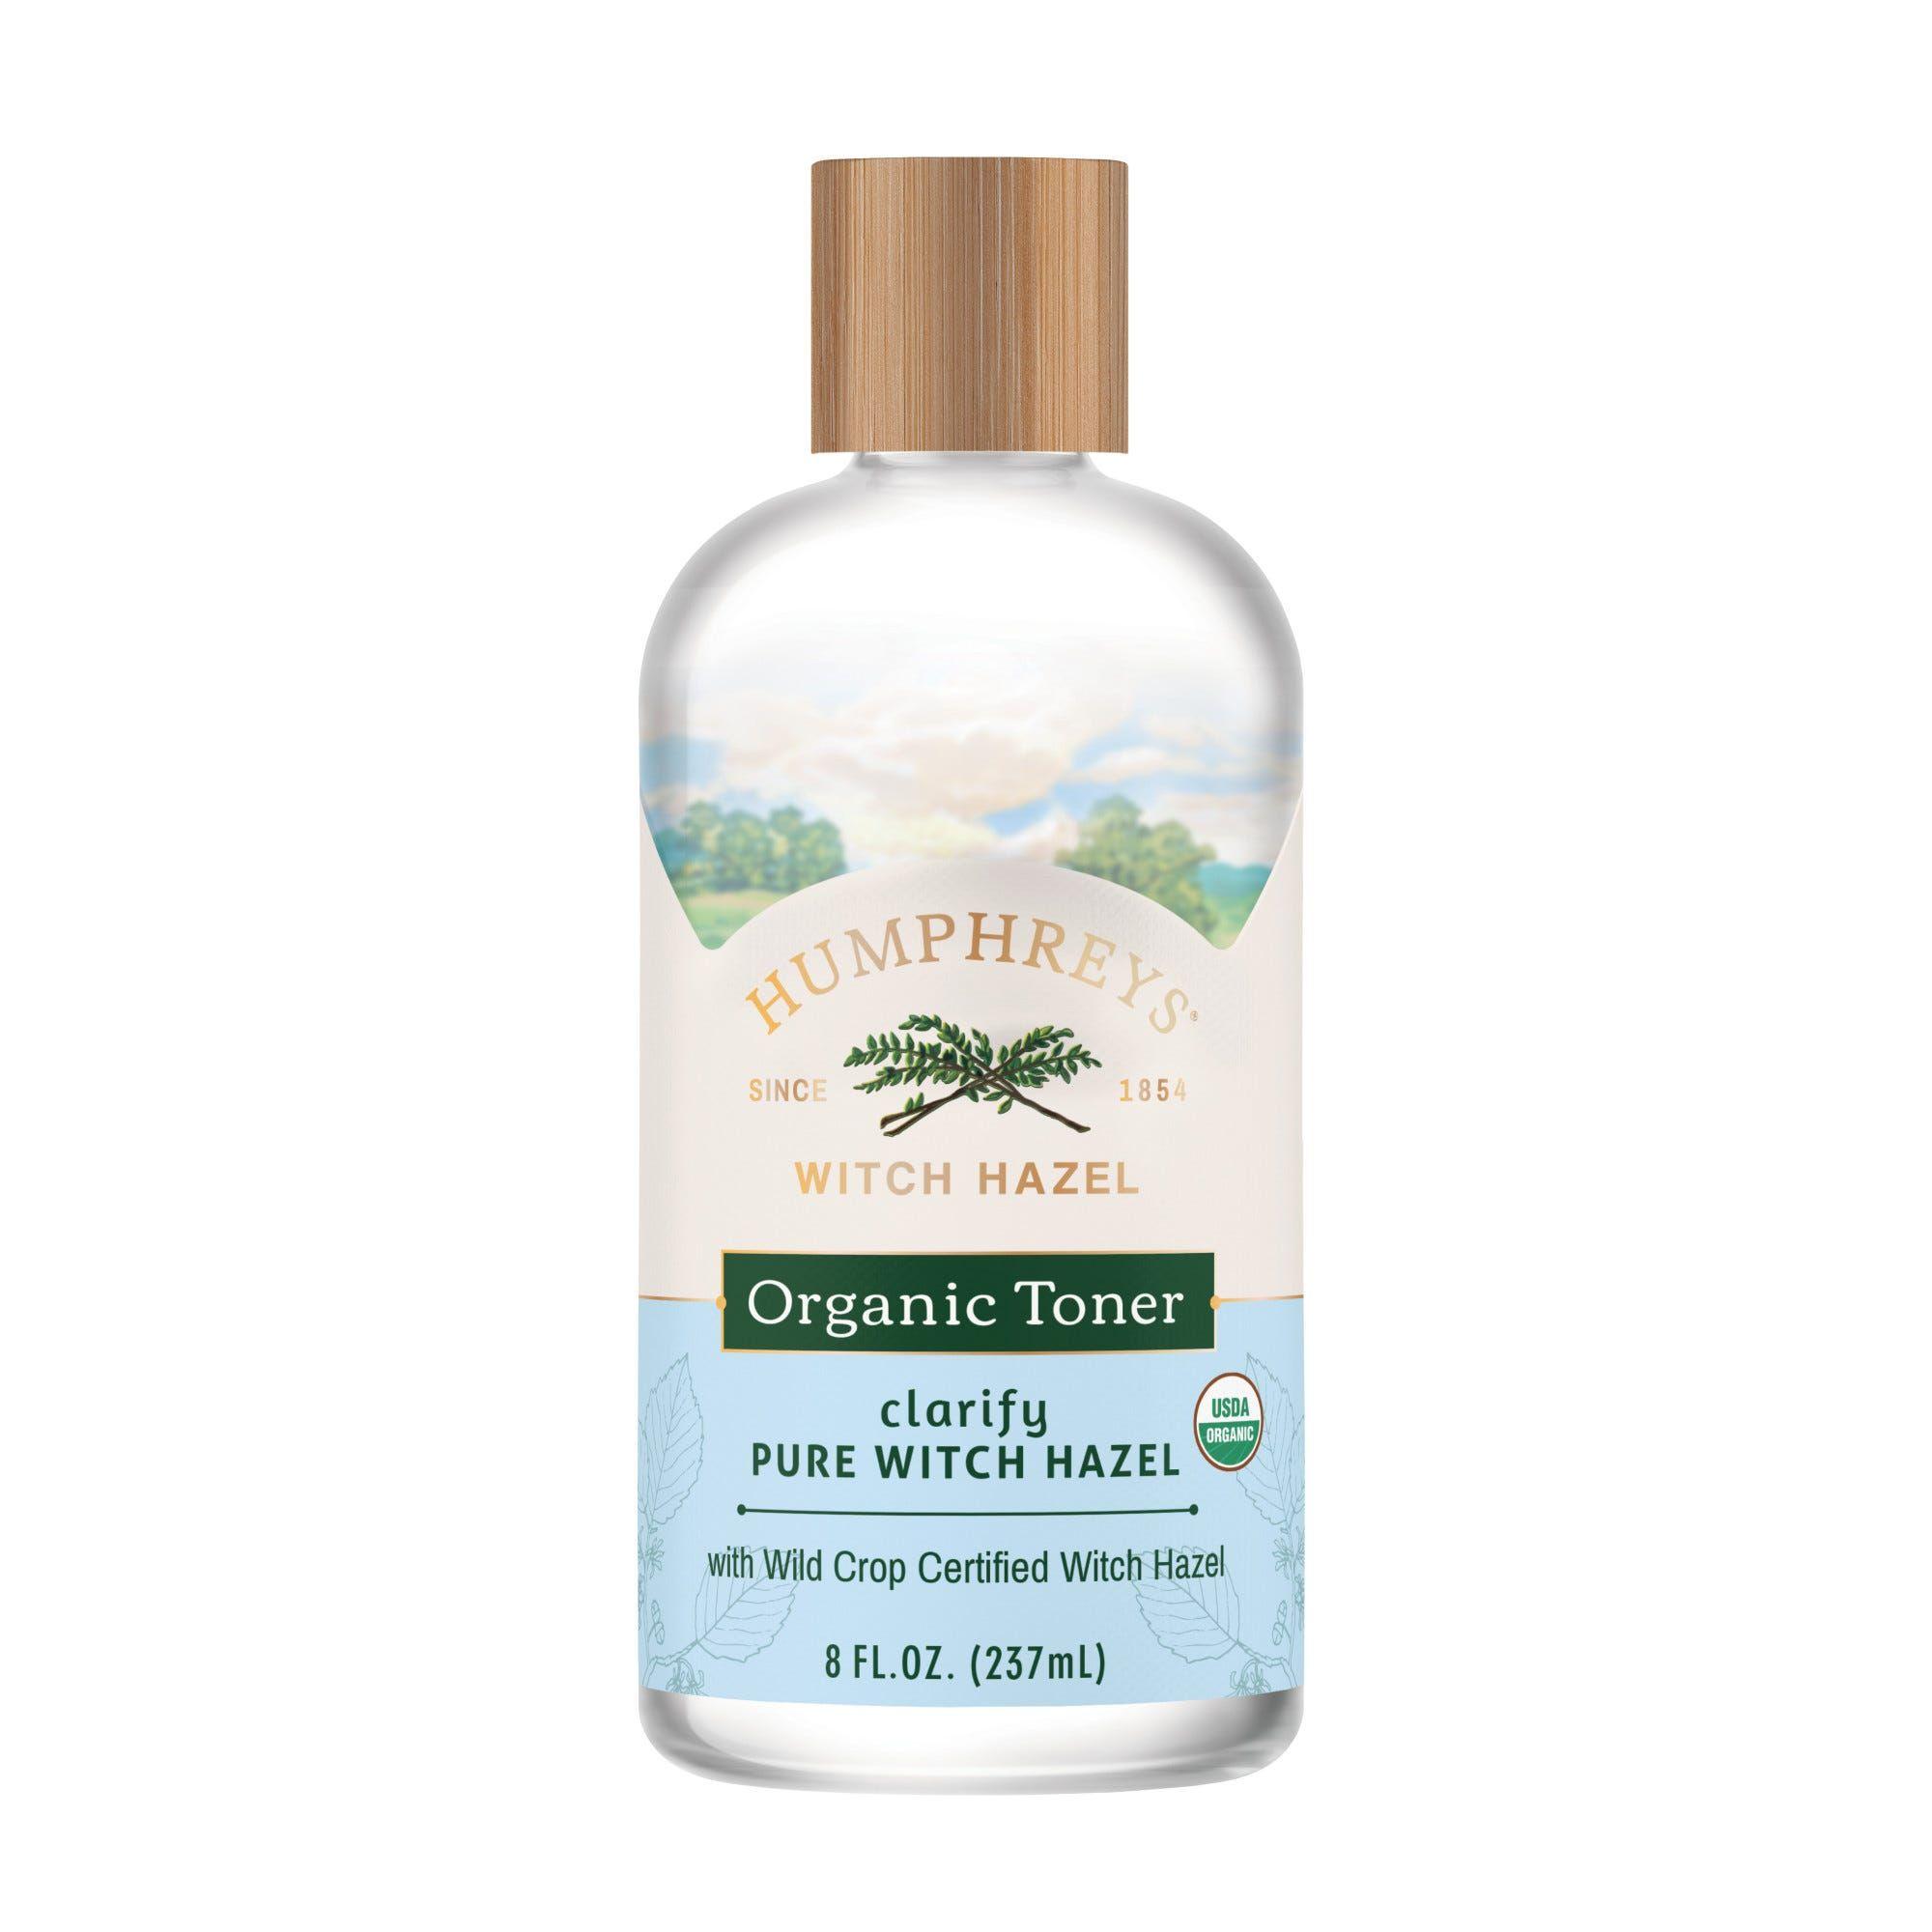 Humphreys Witch Hazel, Clarify Organic Toner - 8 oz